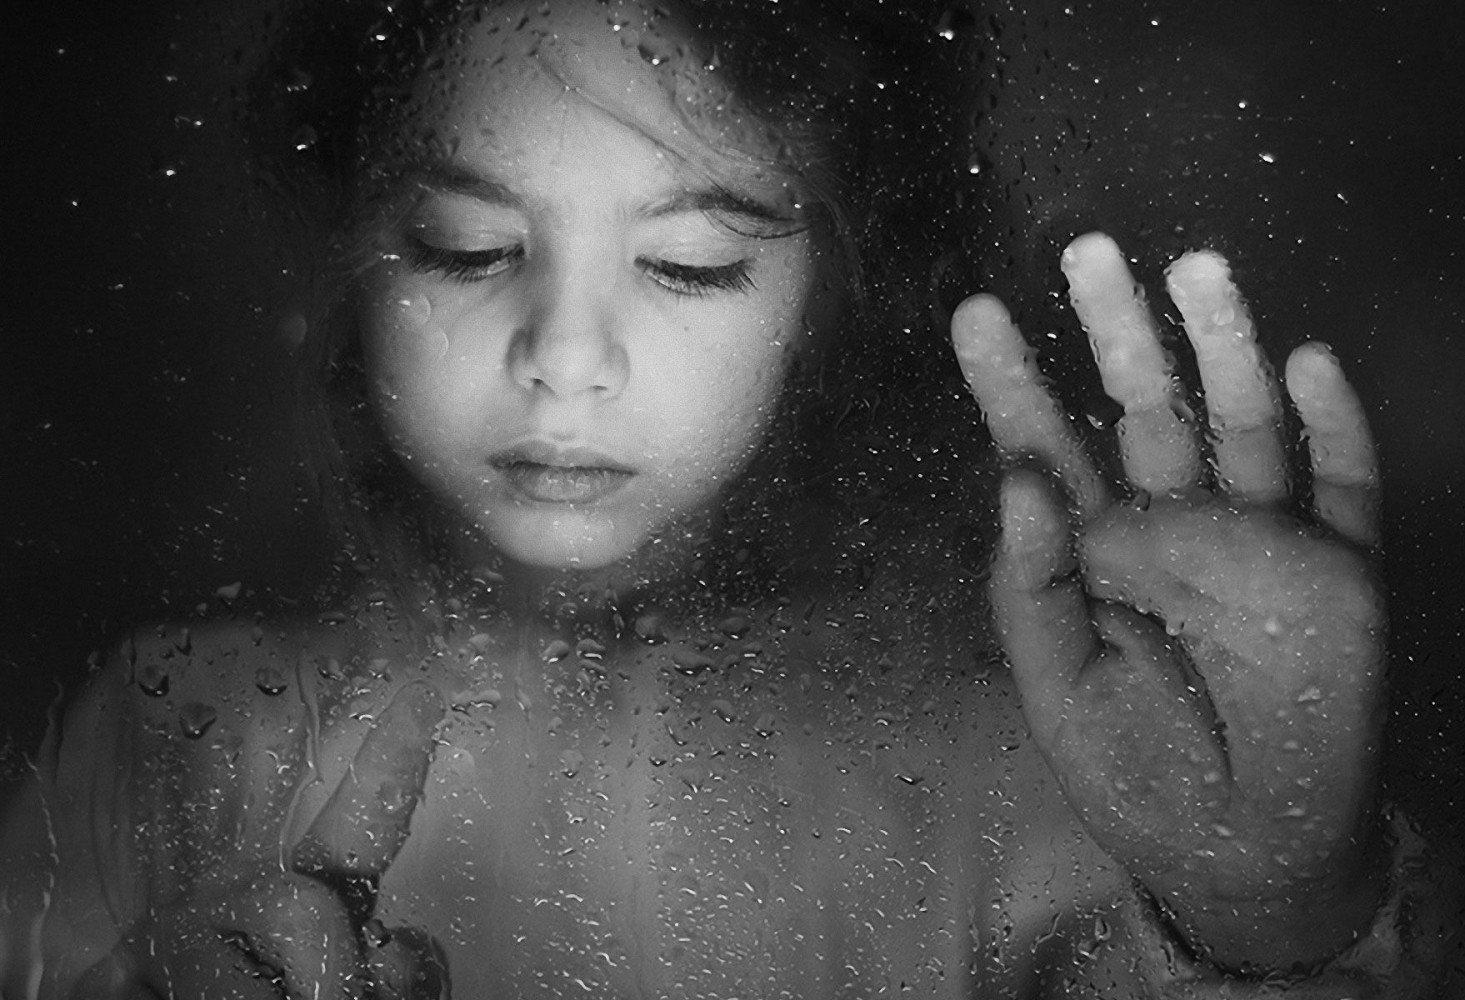 dievcatko-kvapky-vody-ruka-163643.jpg